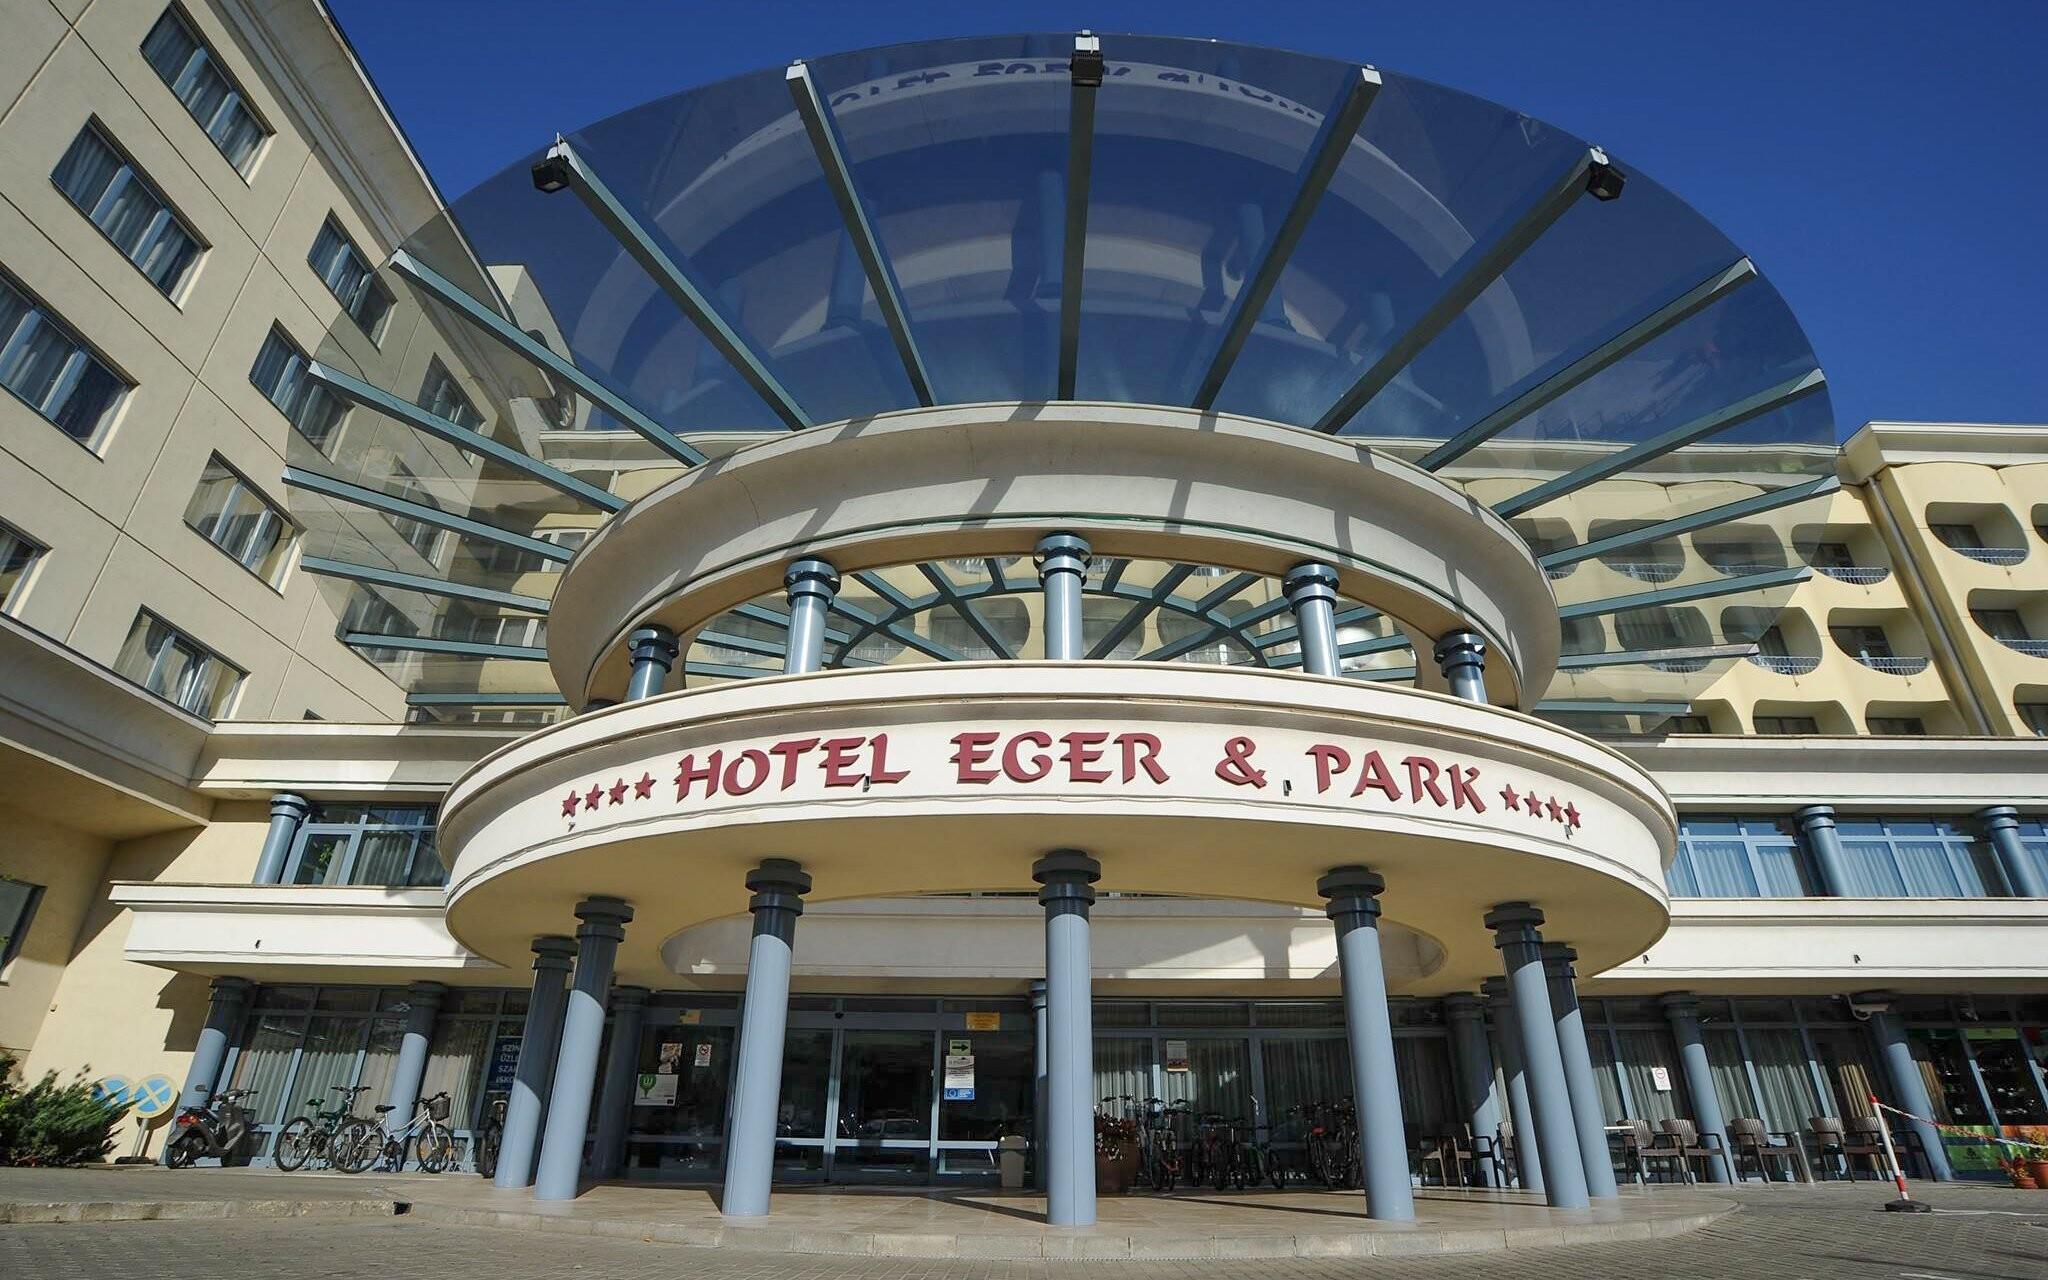 Hotel Eger & Park **** s kúpeľmi, Eger, Maďarsko